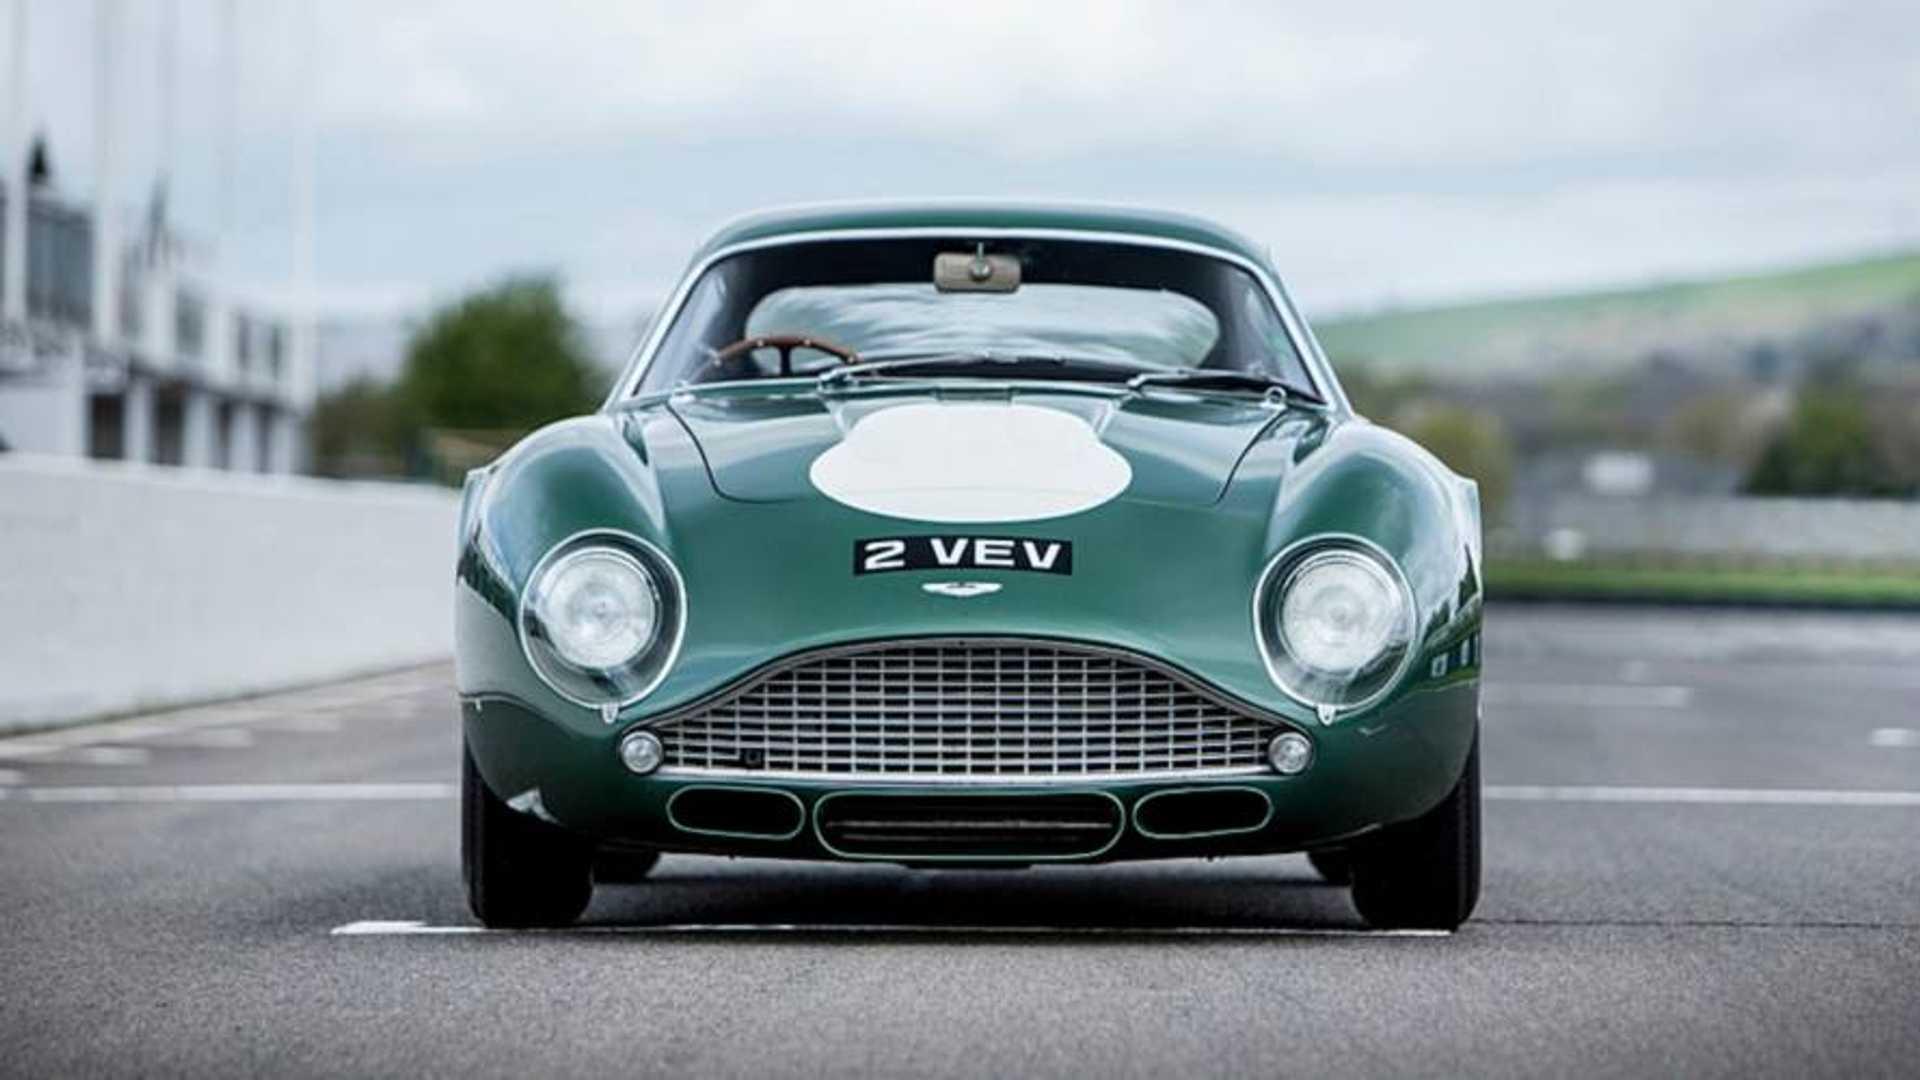 Aston Martin Helps Celebrate 100 Years Of Zagato With Dbz Pair